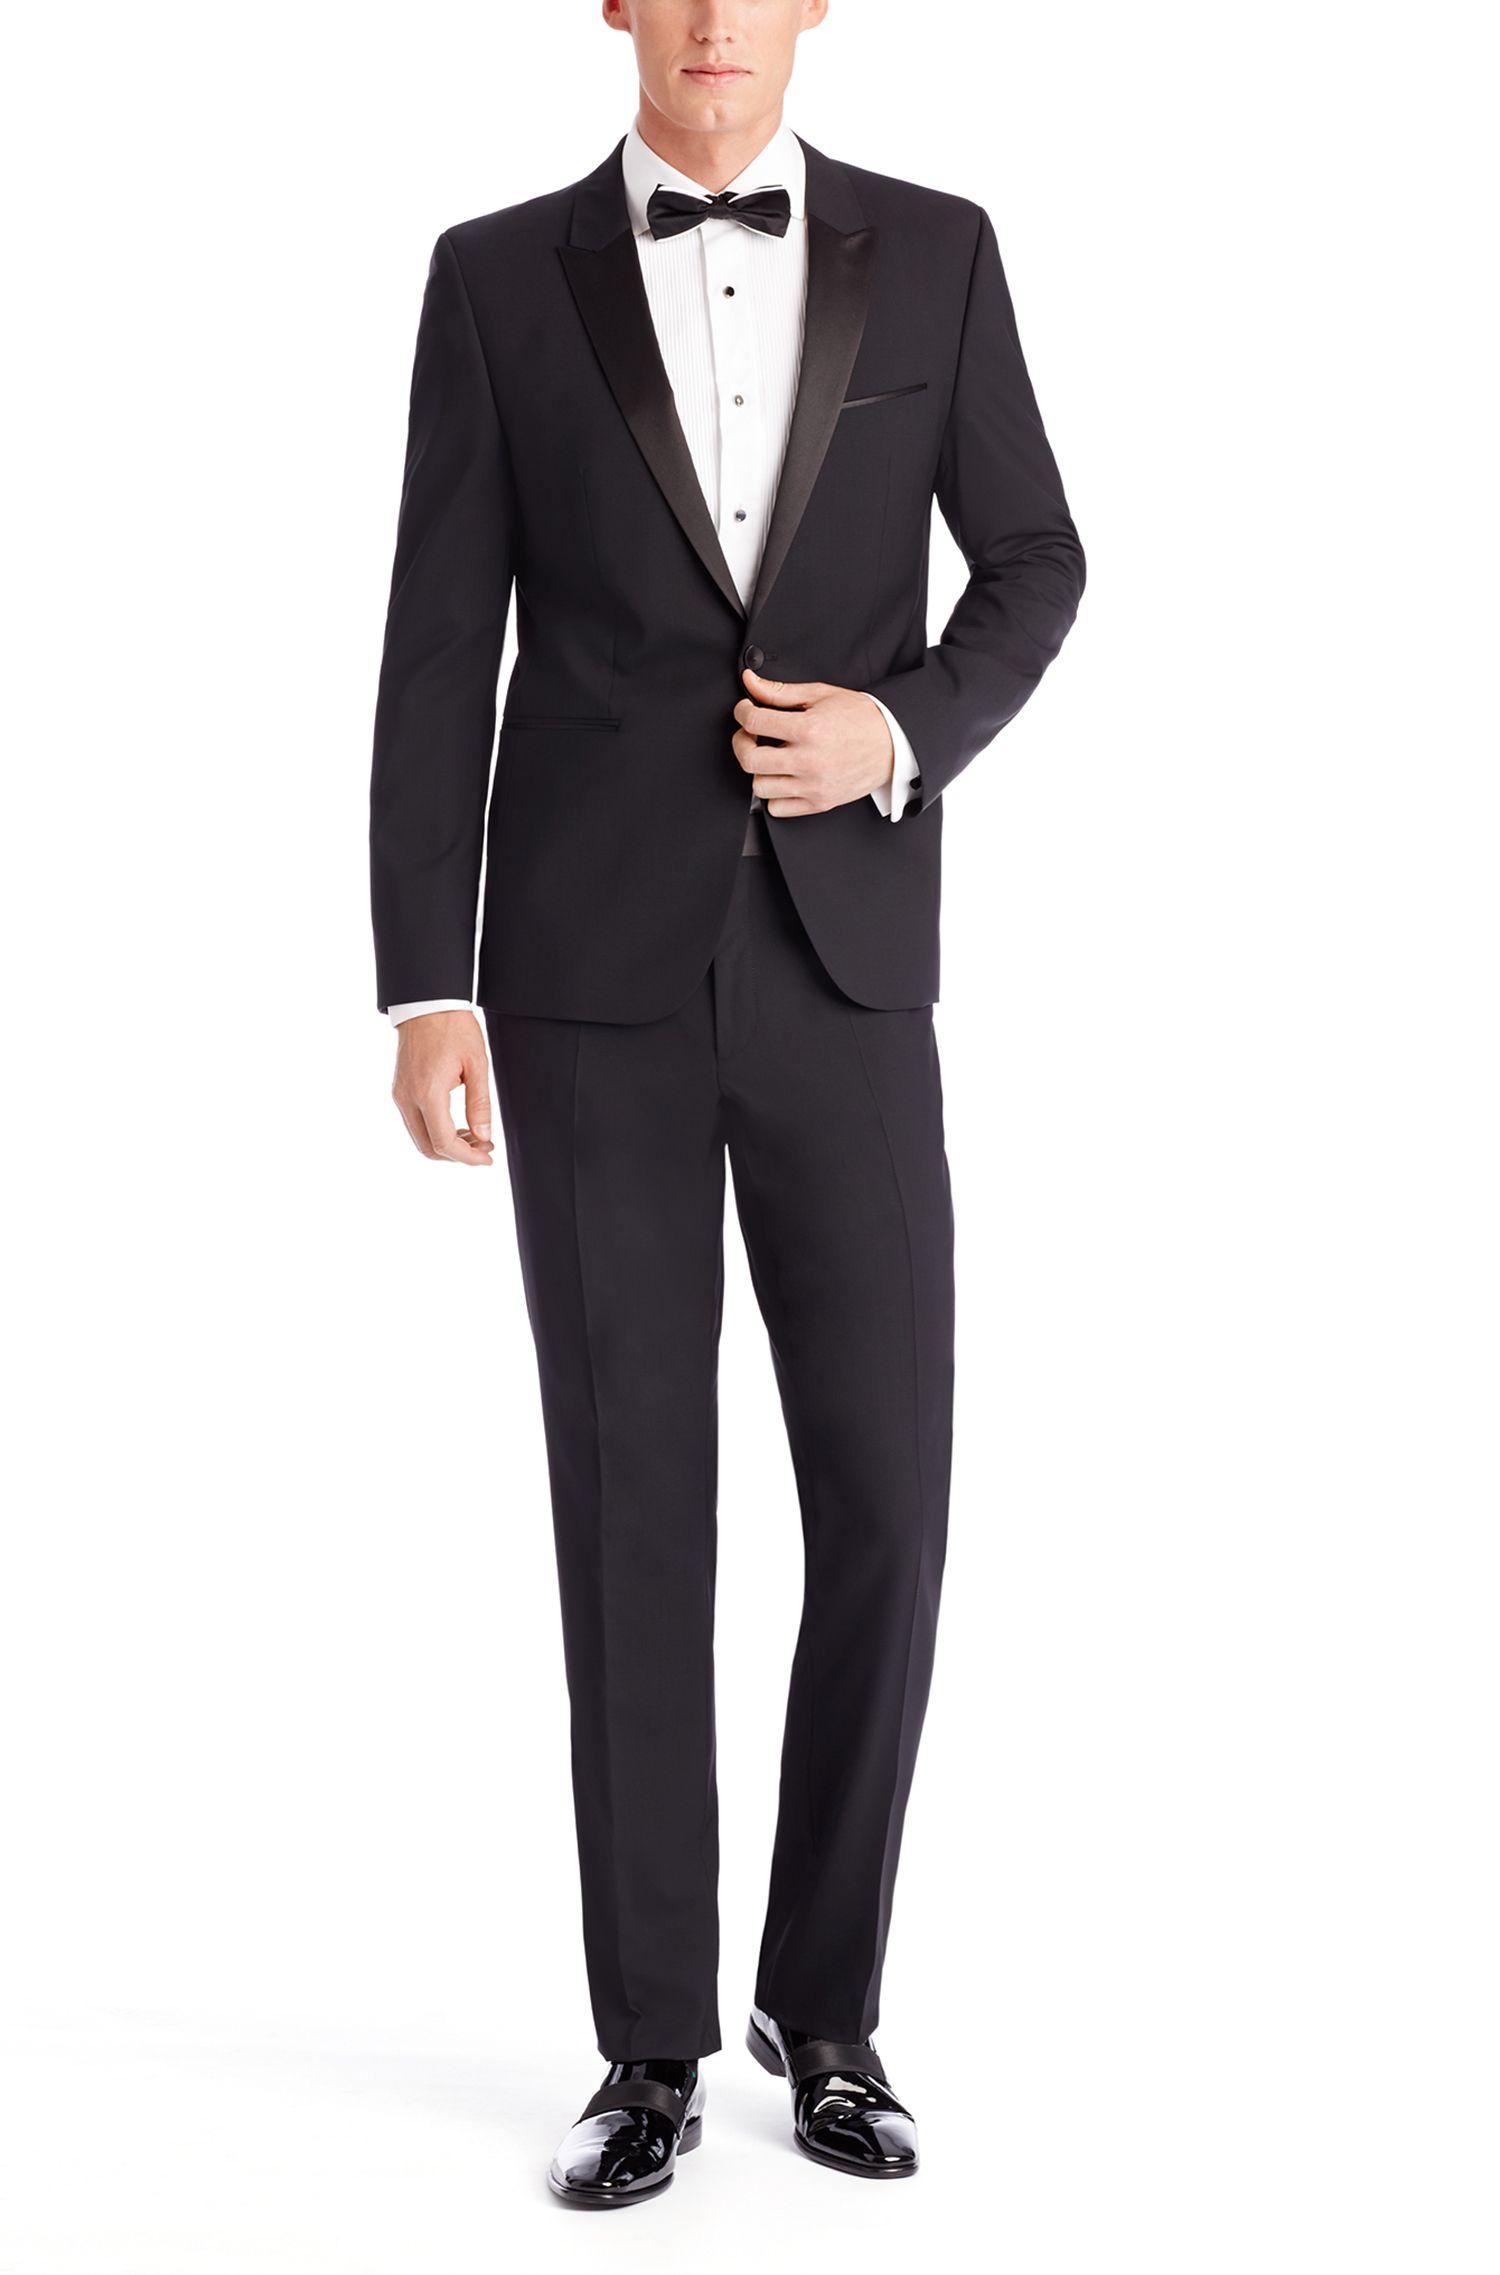 'Aylor/Herys' | Slim Fit, Stretch Virgin Wool Tuxedo